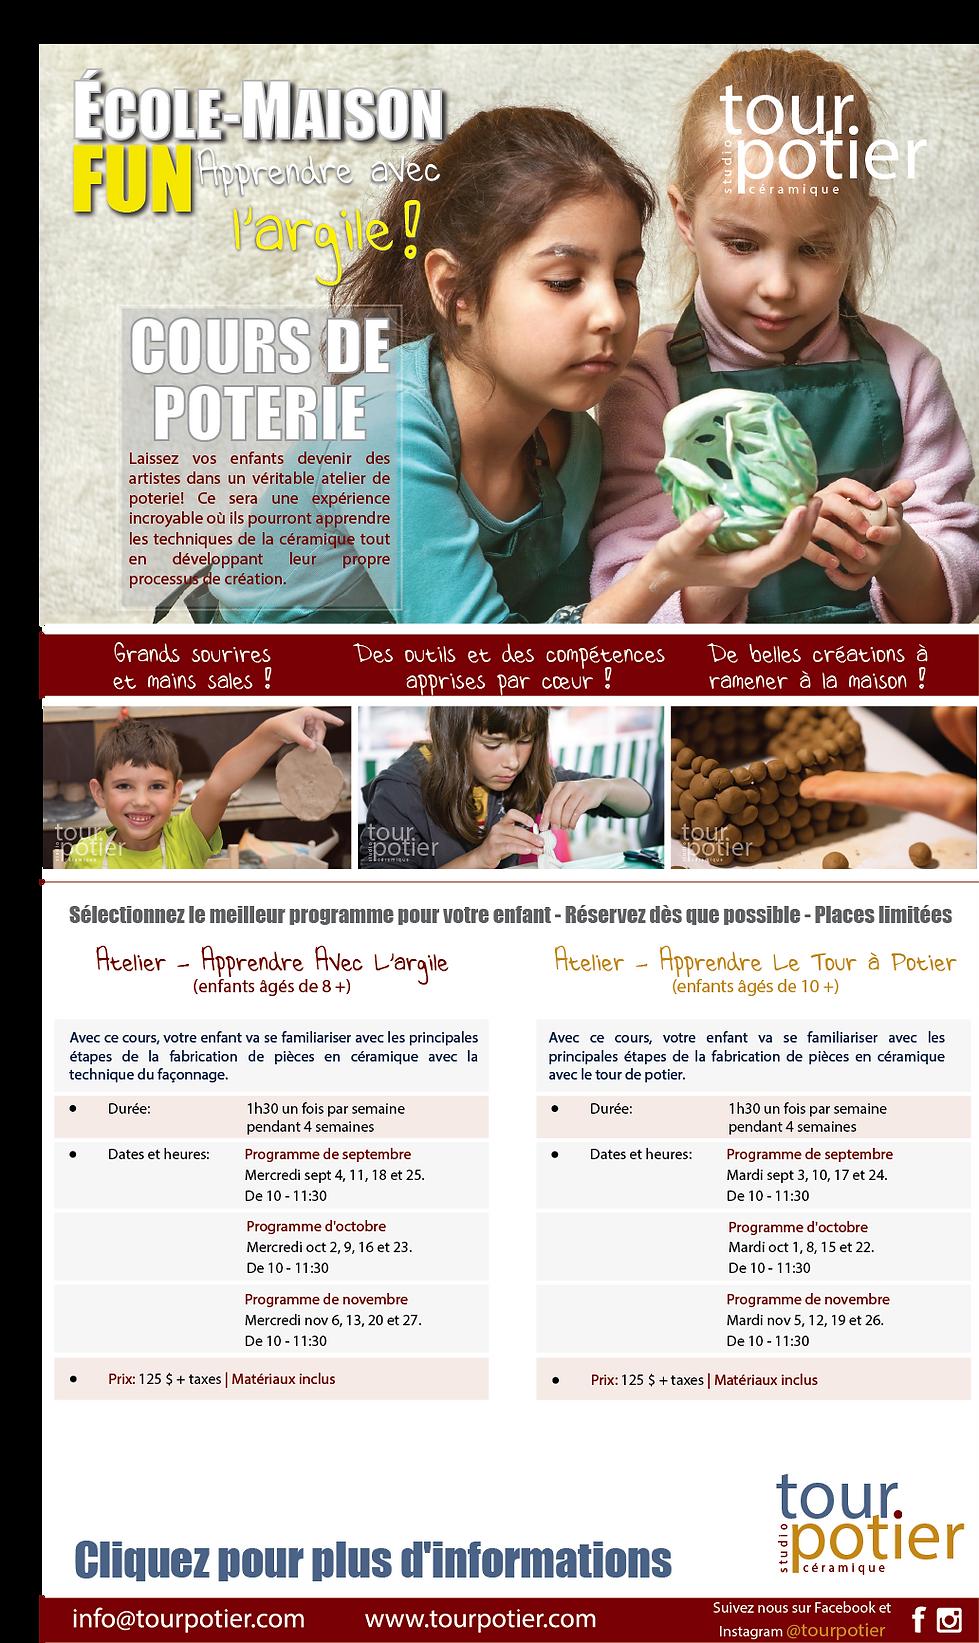 HomeSchooling AdFrench-150dpi.png